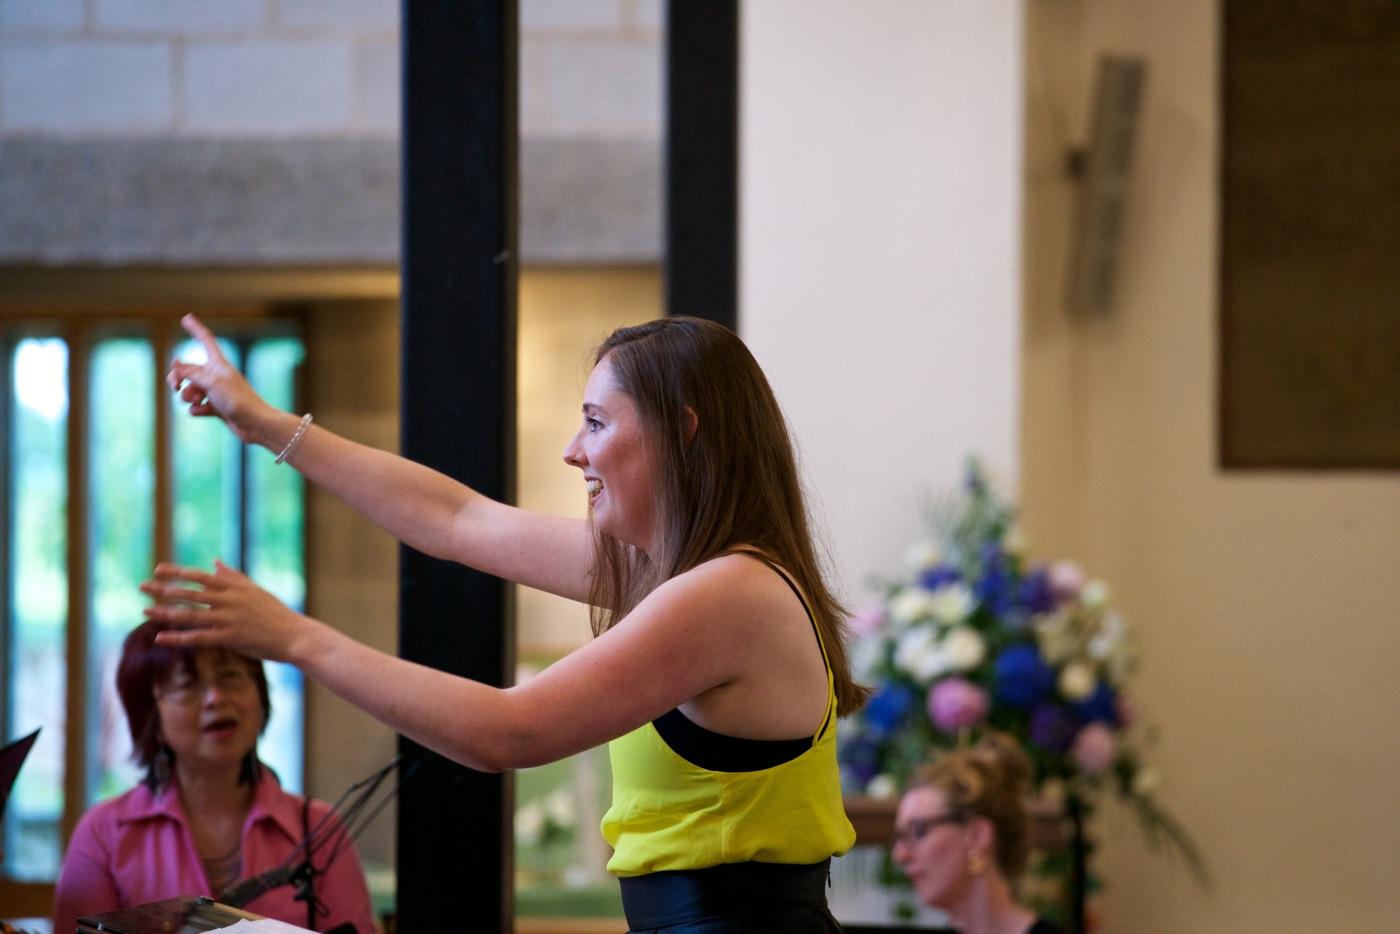 Cantar in concert in St Olaves Church